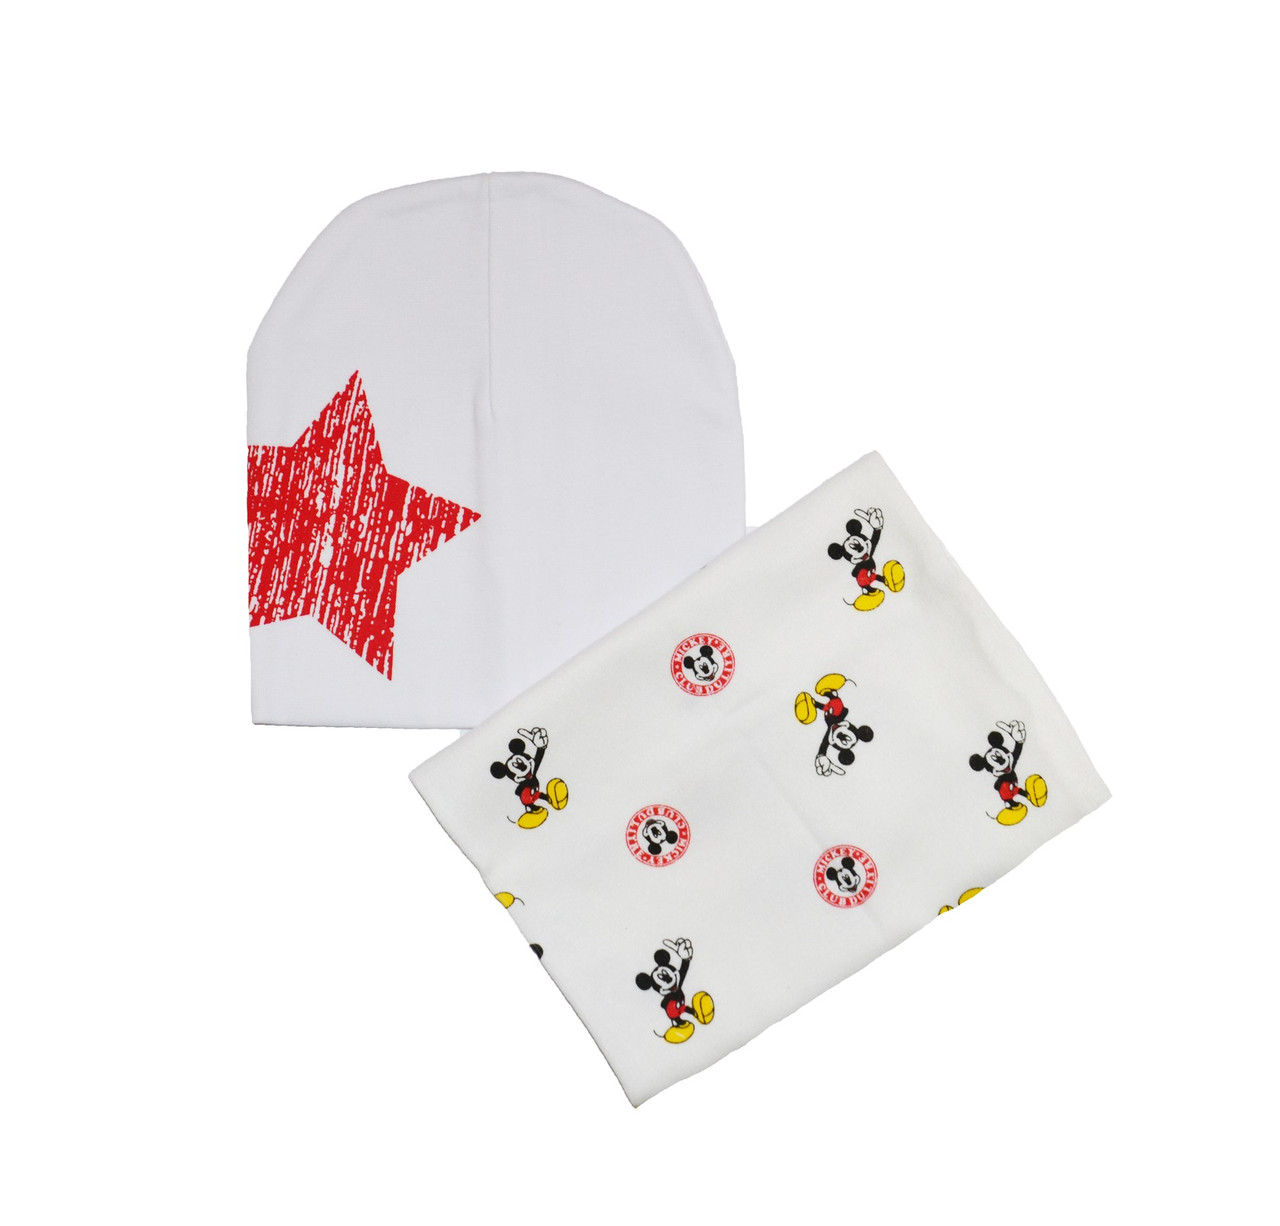 Комплект шапка и шарф-хомут белые с рисунком Микки Маус